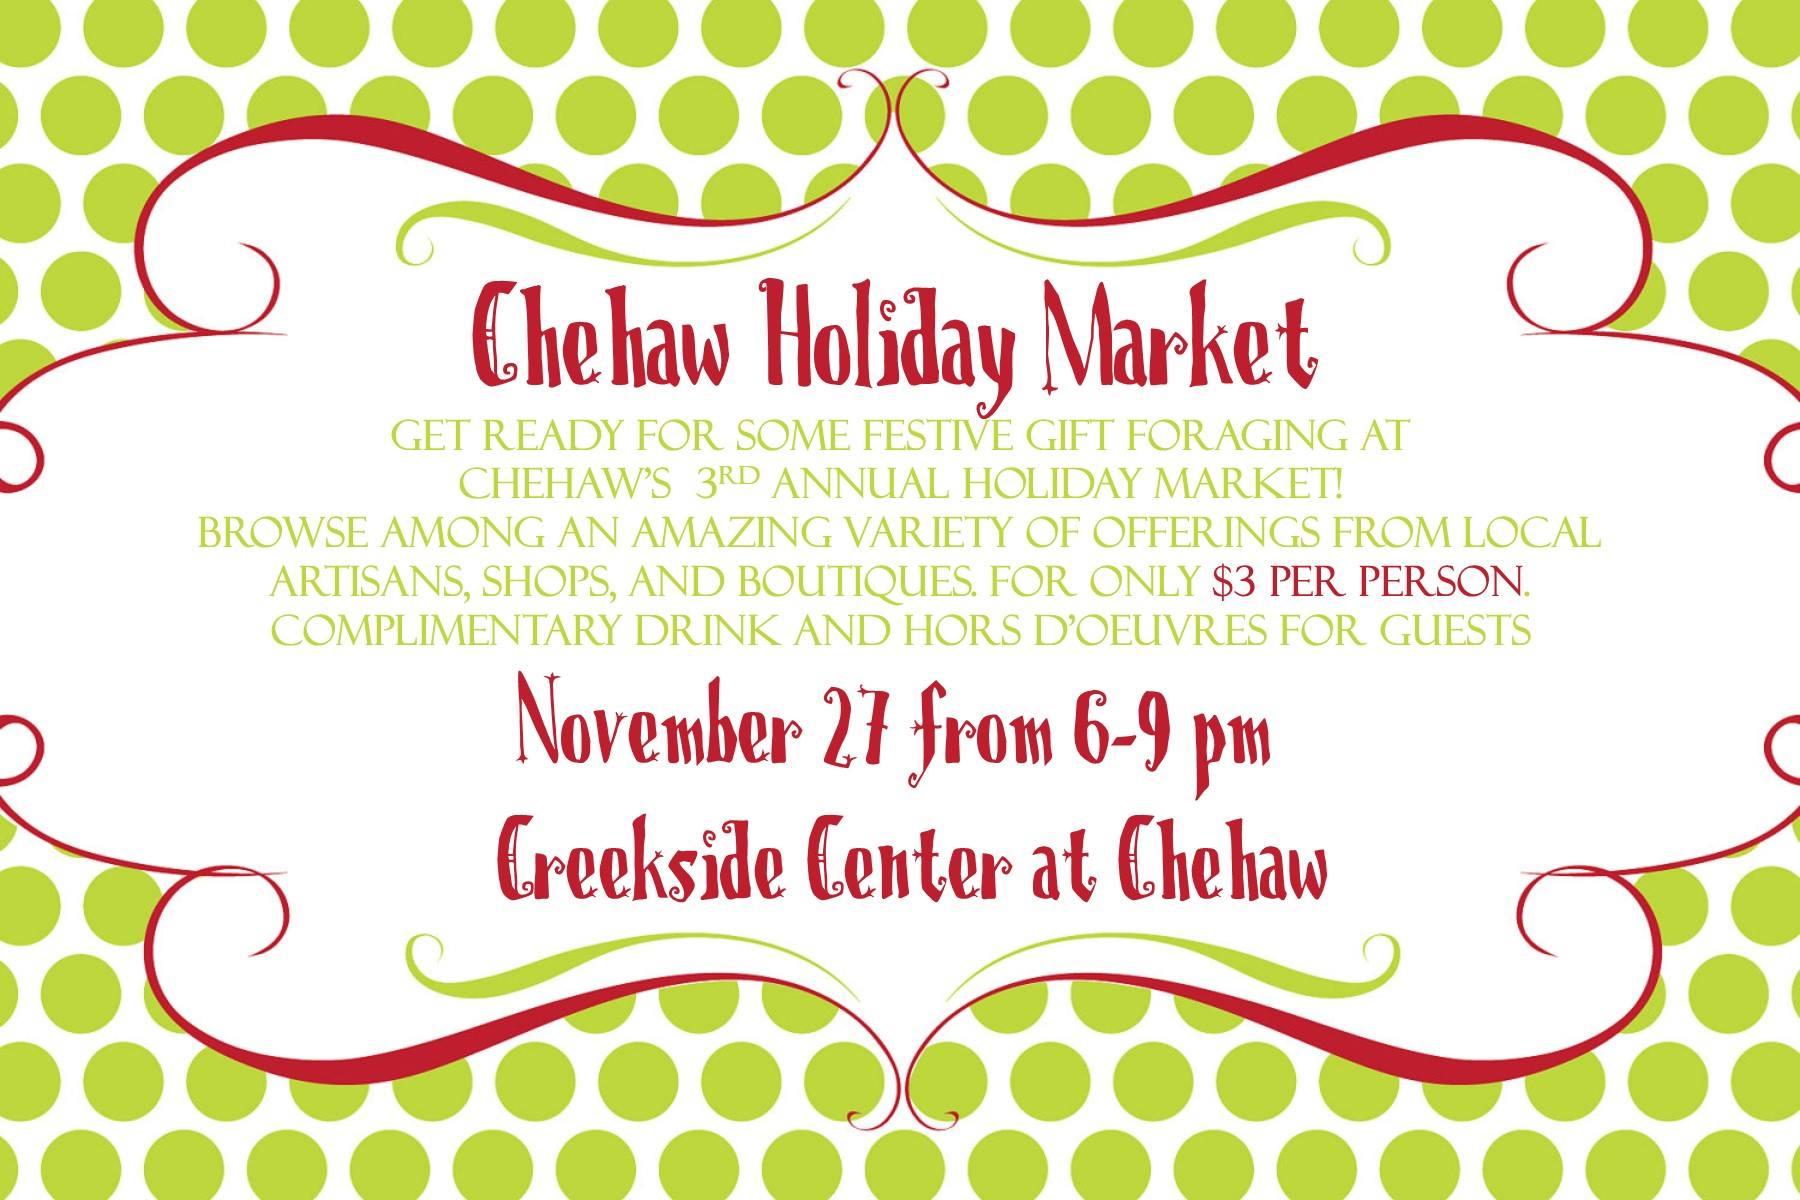 Chehaw Holiday Market